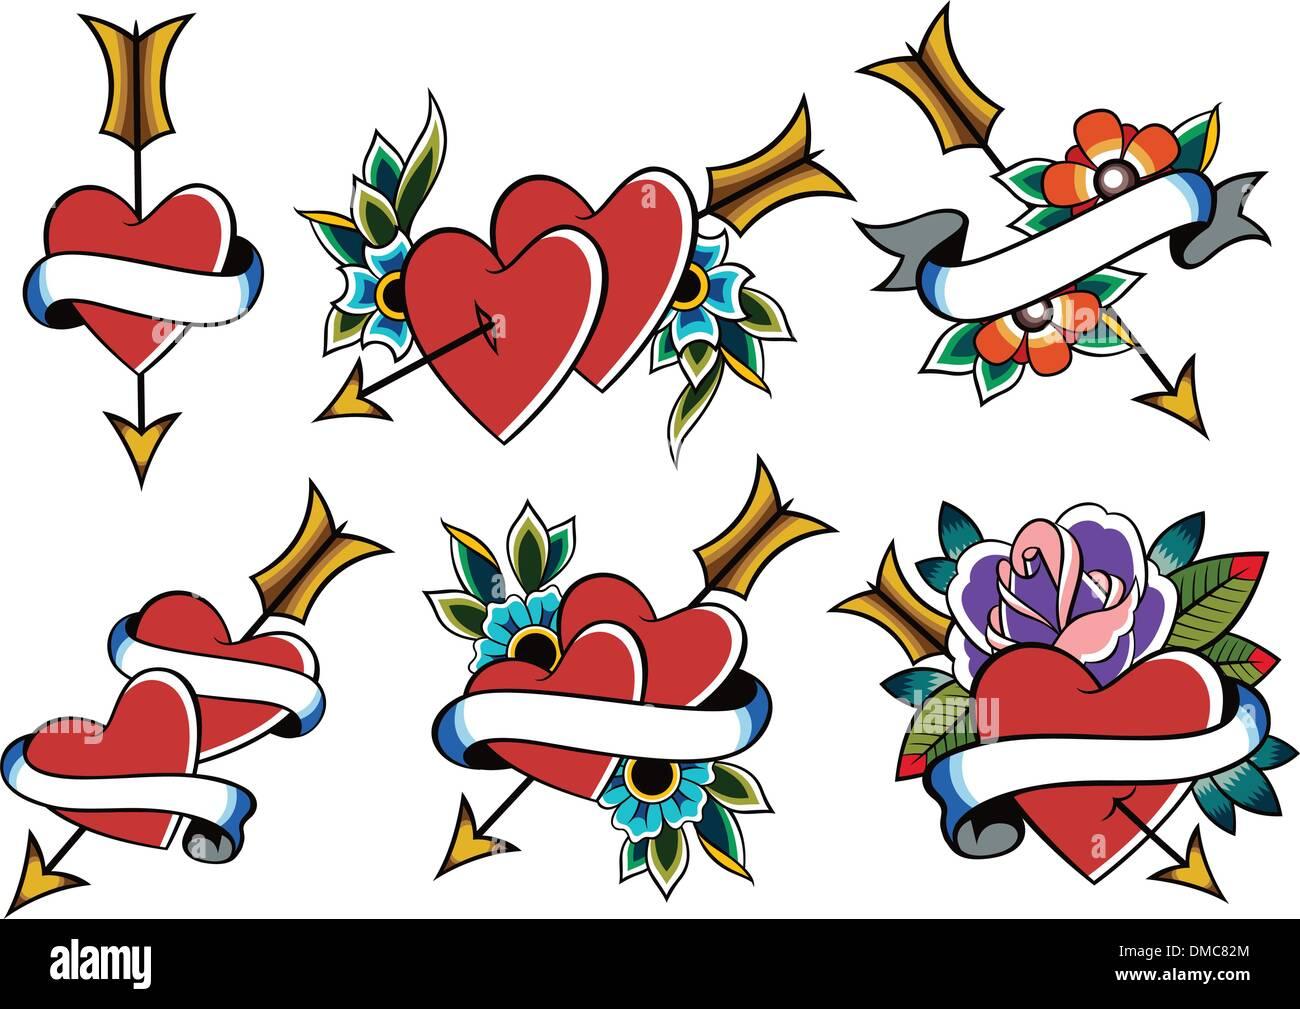 classic vintage heart tattoo stock vector art illustration vector rh alamy com vintage mom heart tattoo vintage heart lock tattoo